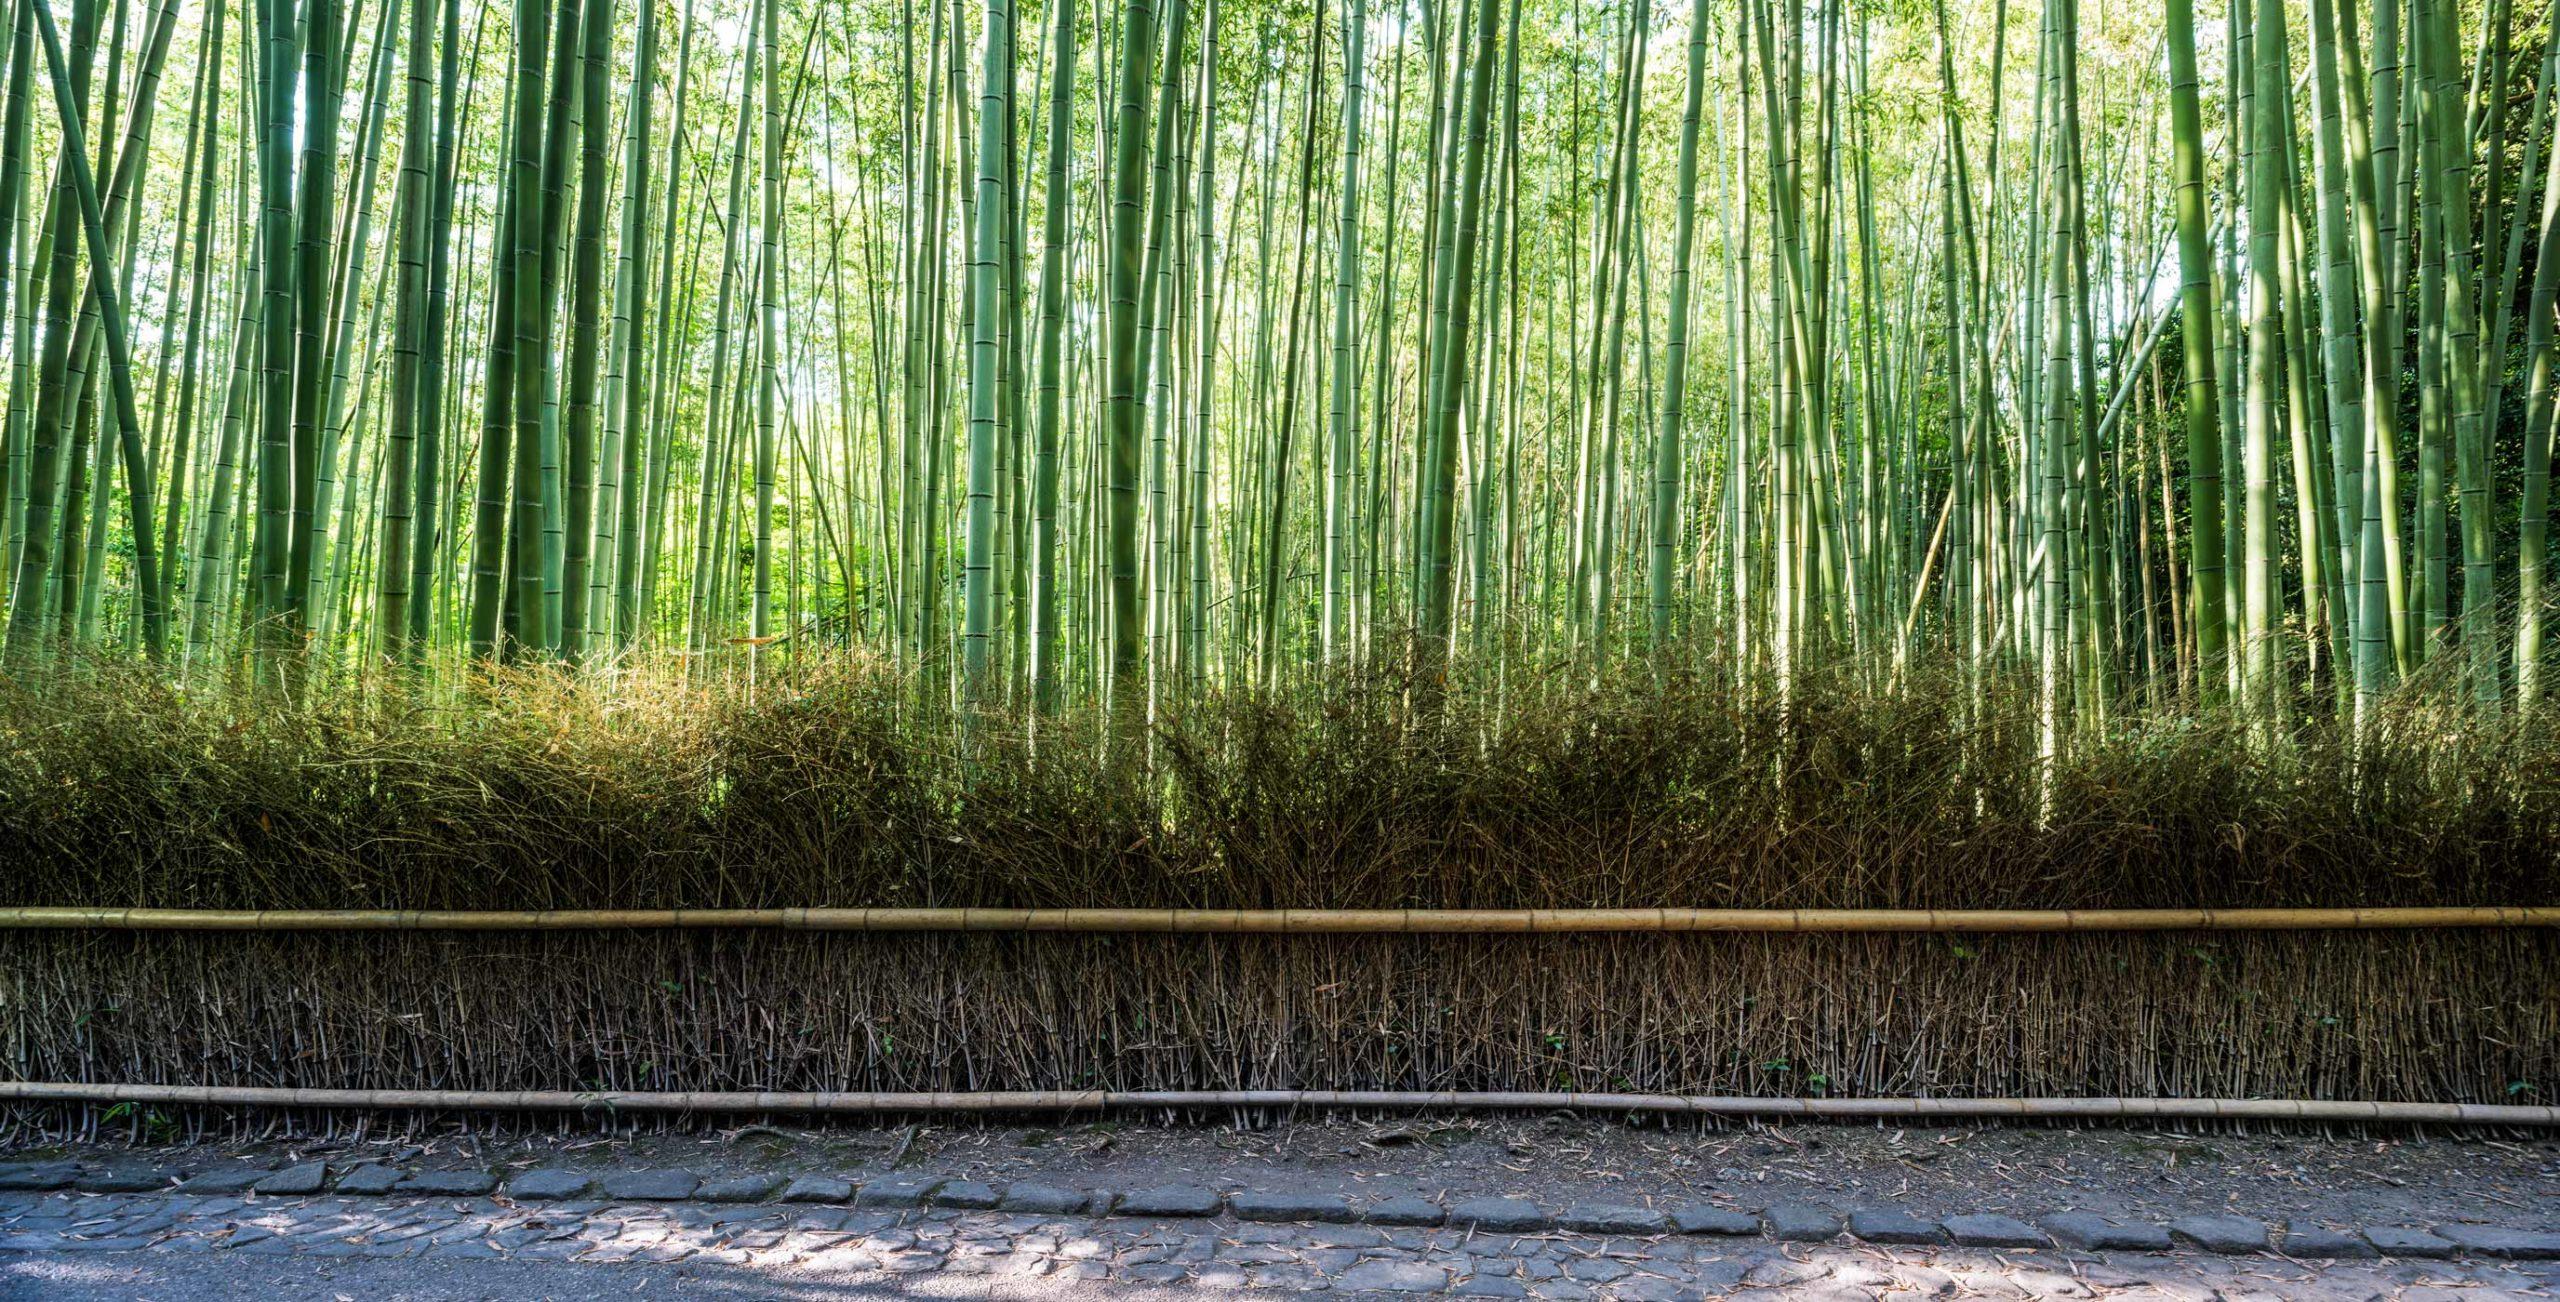 Bamboo-park-1